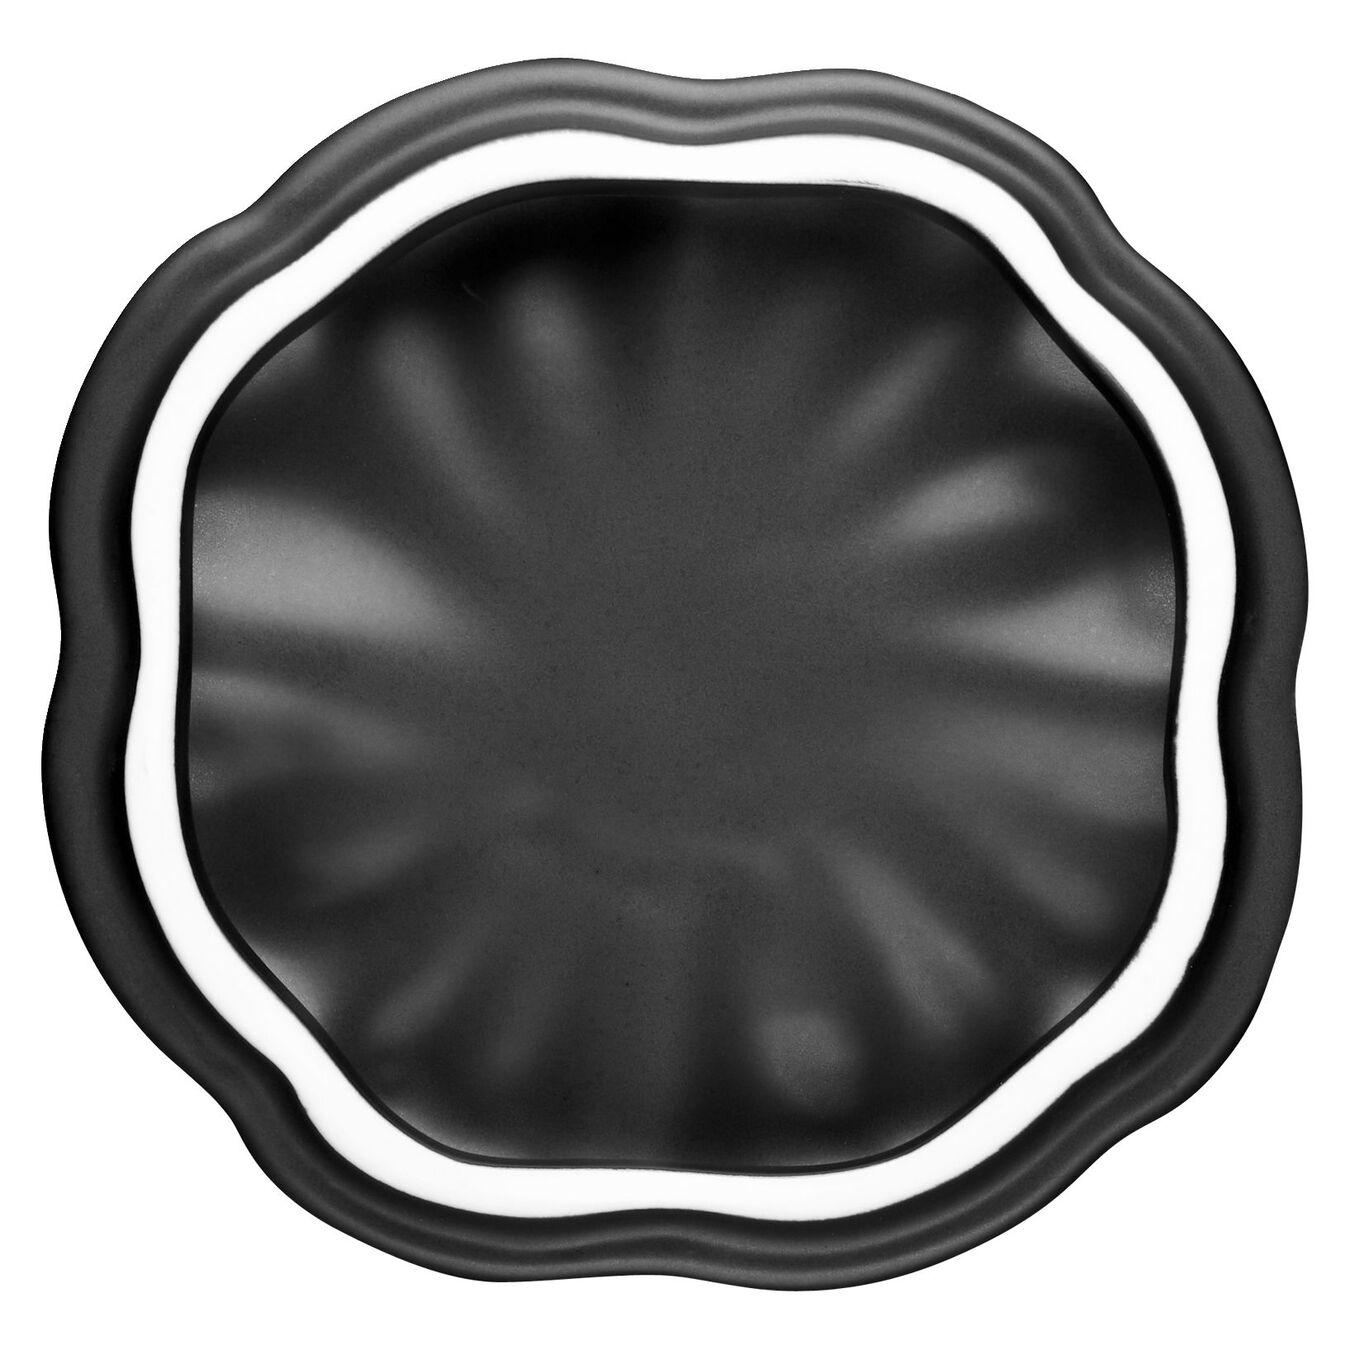 Keramik-Kürbis 0.5qt / 0.47 l - Black Matte 12 cm, Kürbis, Schwarz, Keramik,,large 2